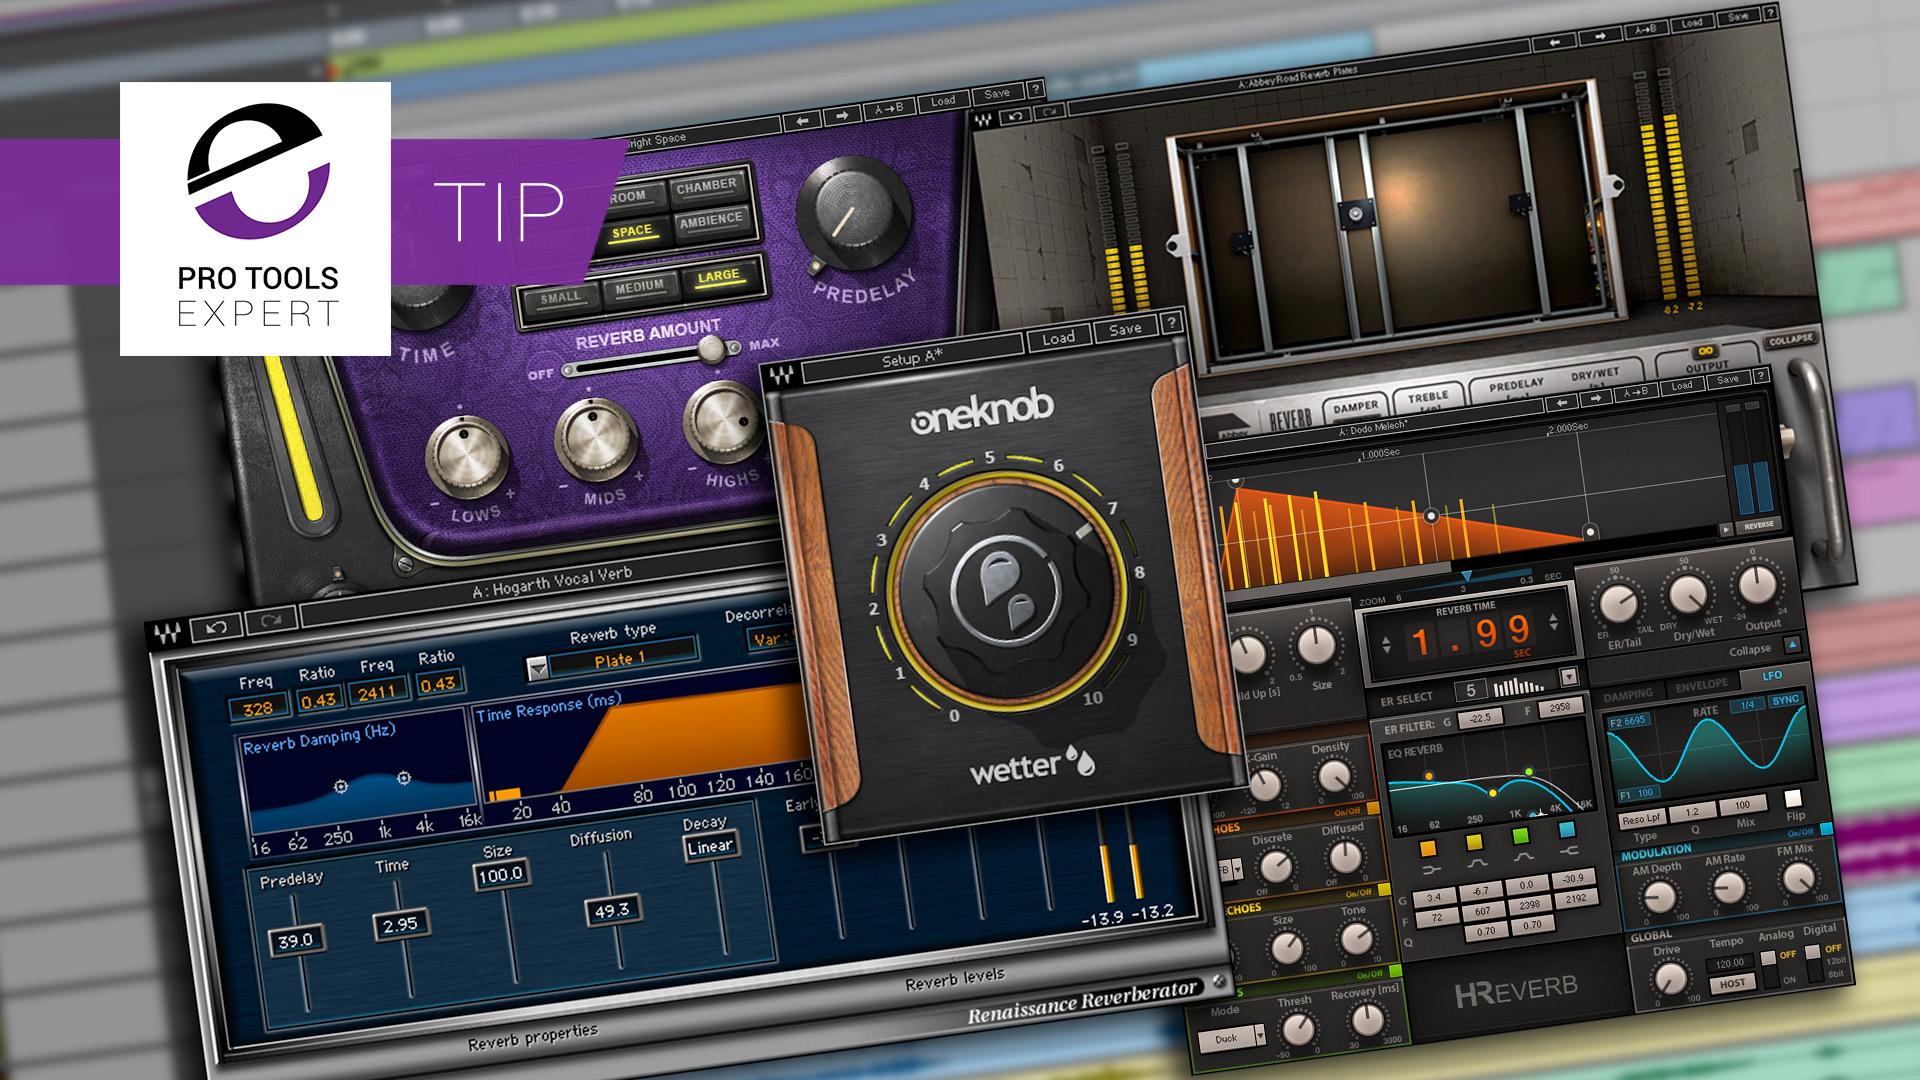 waves-reverb-plug-ins-for-pro-tools.jpg